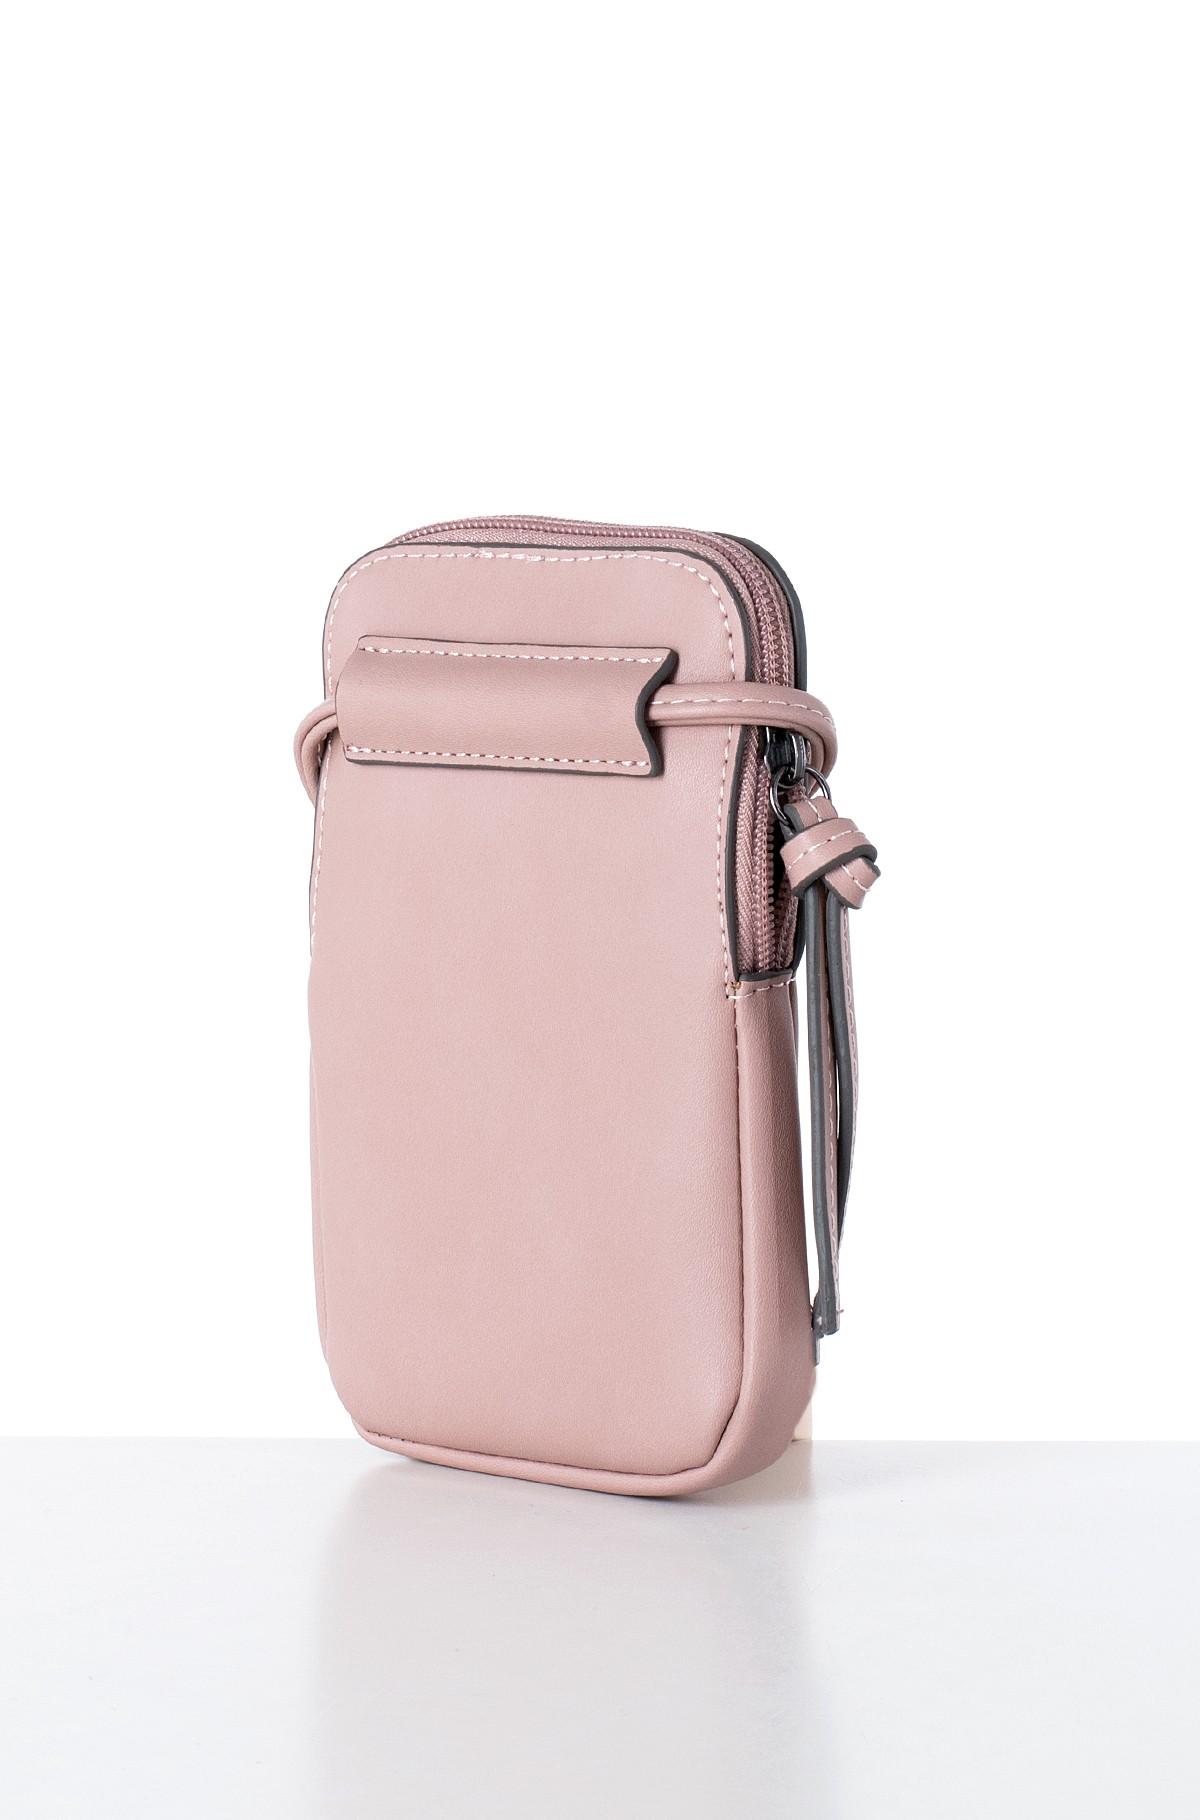 Mobile phone bag  28063-full-3